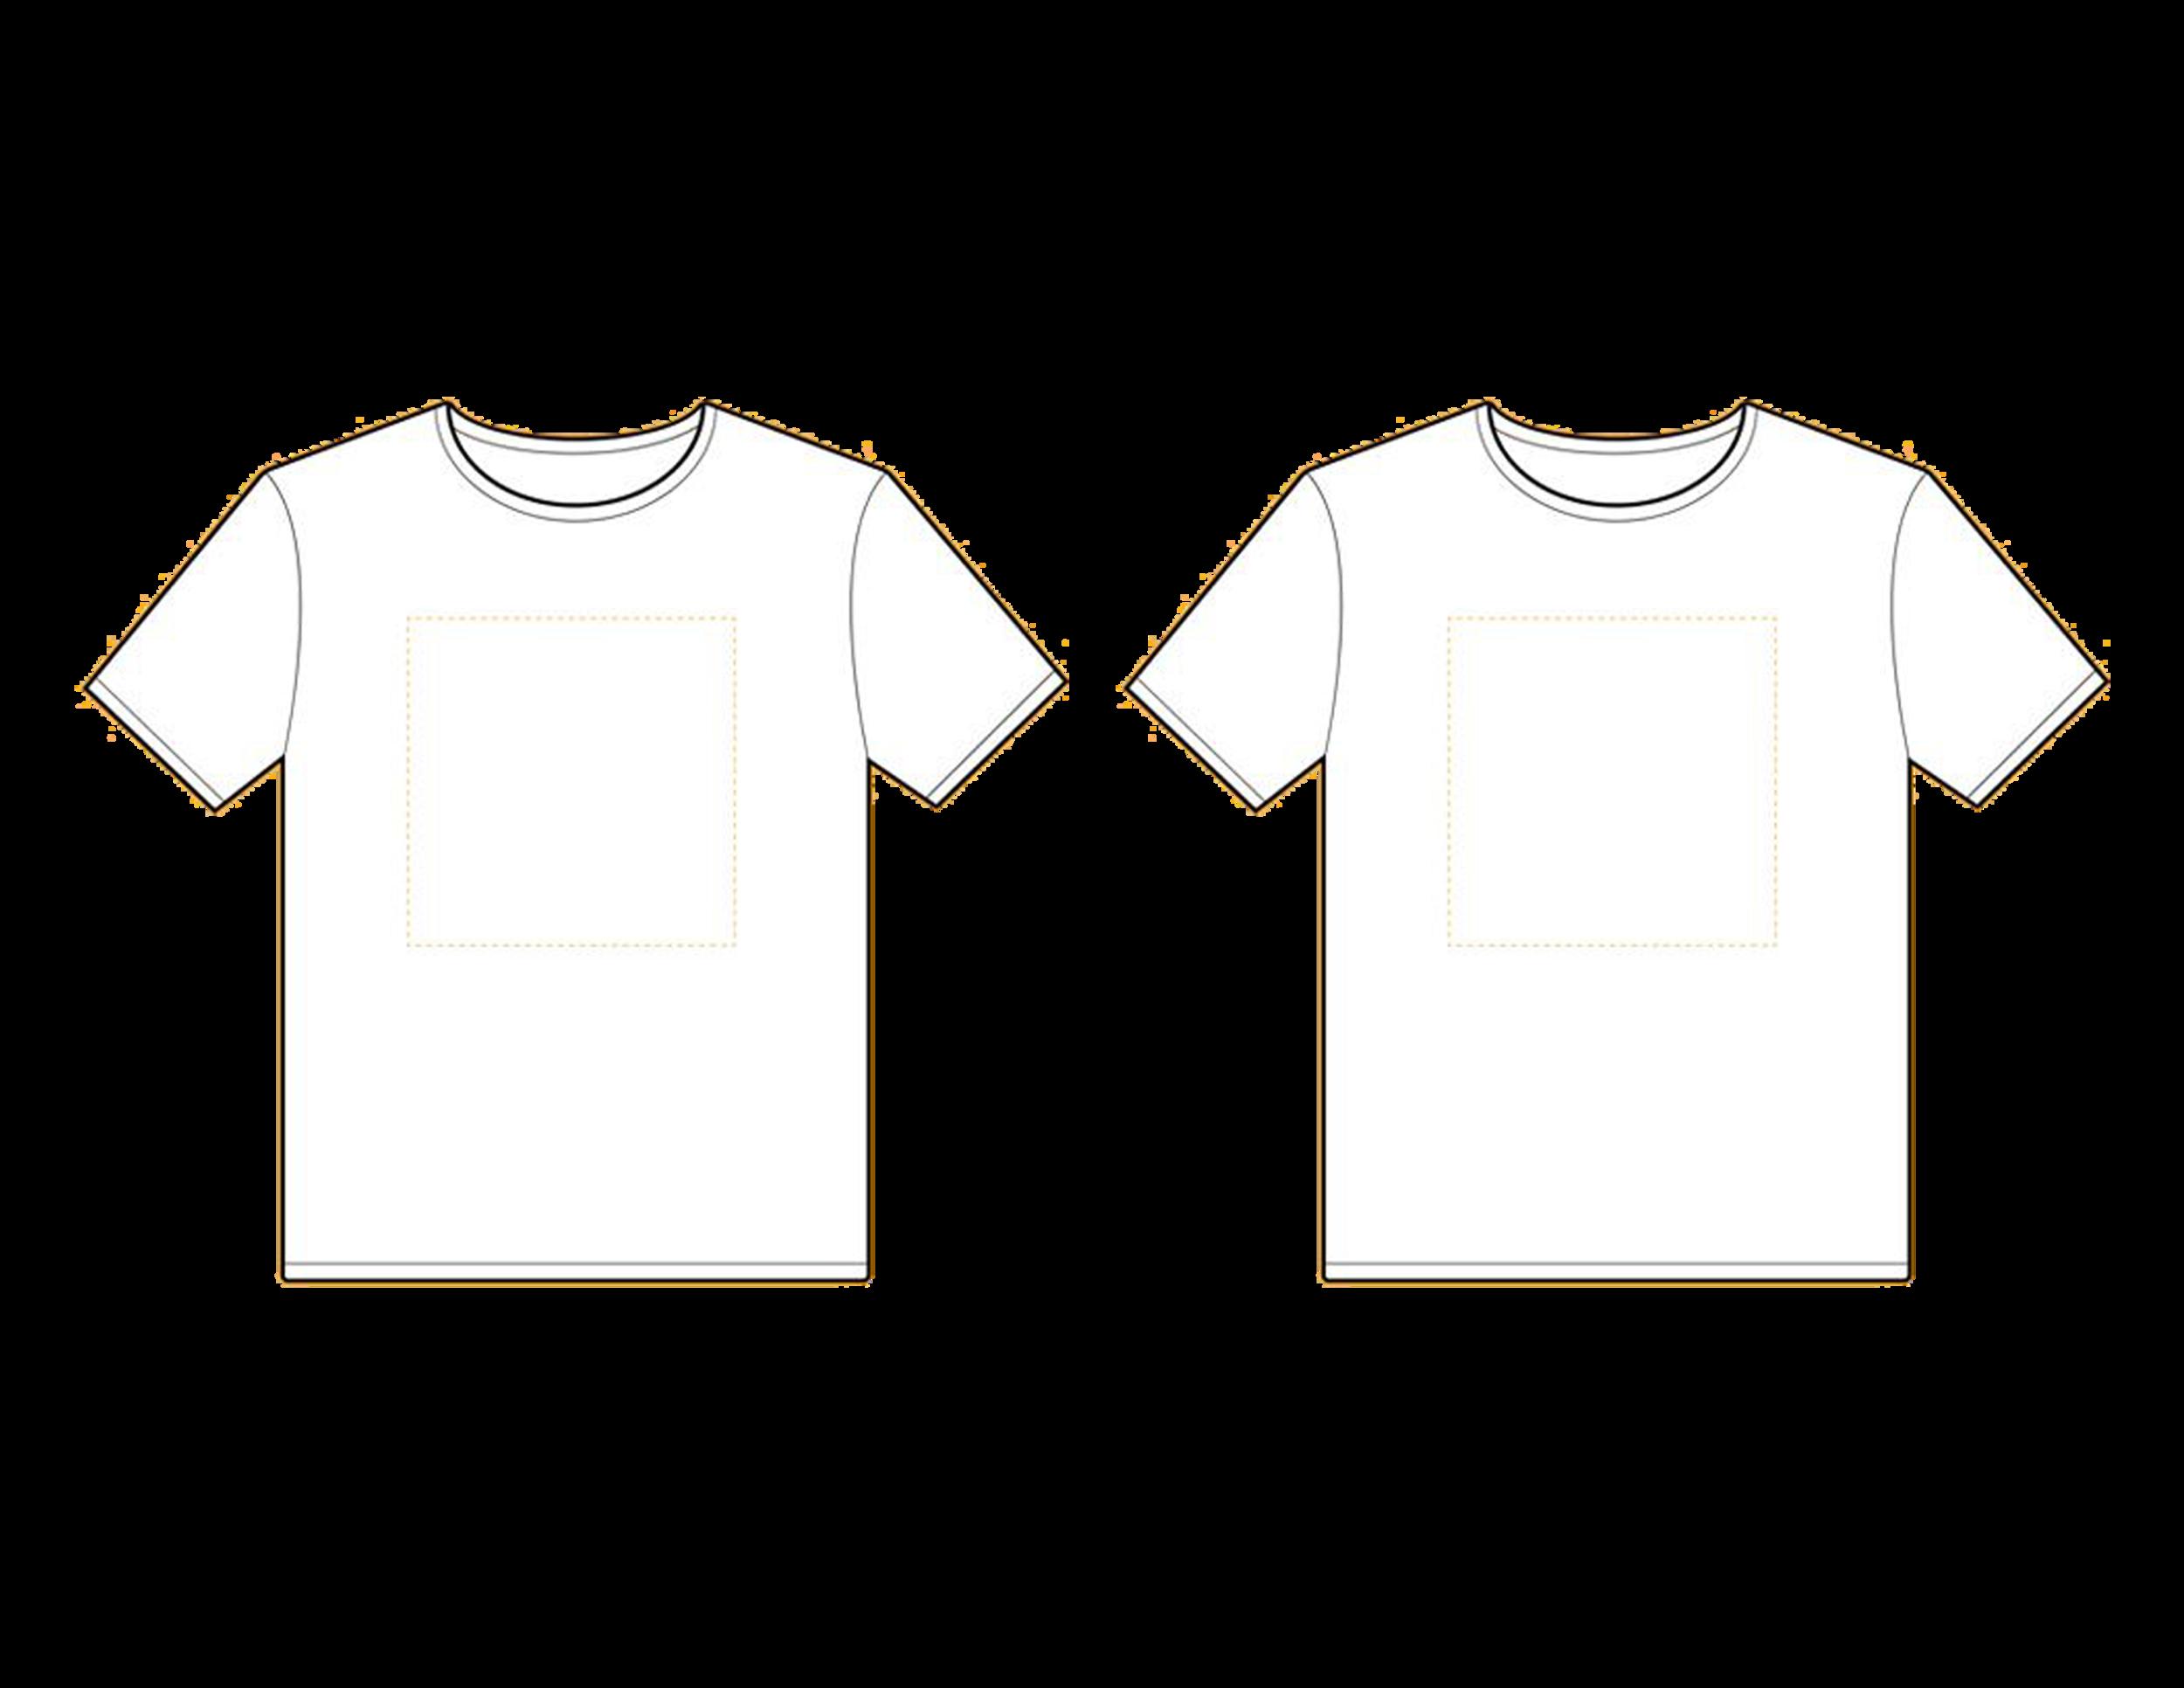 Shirt01.png